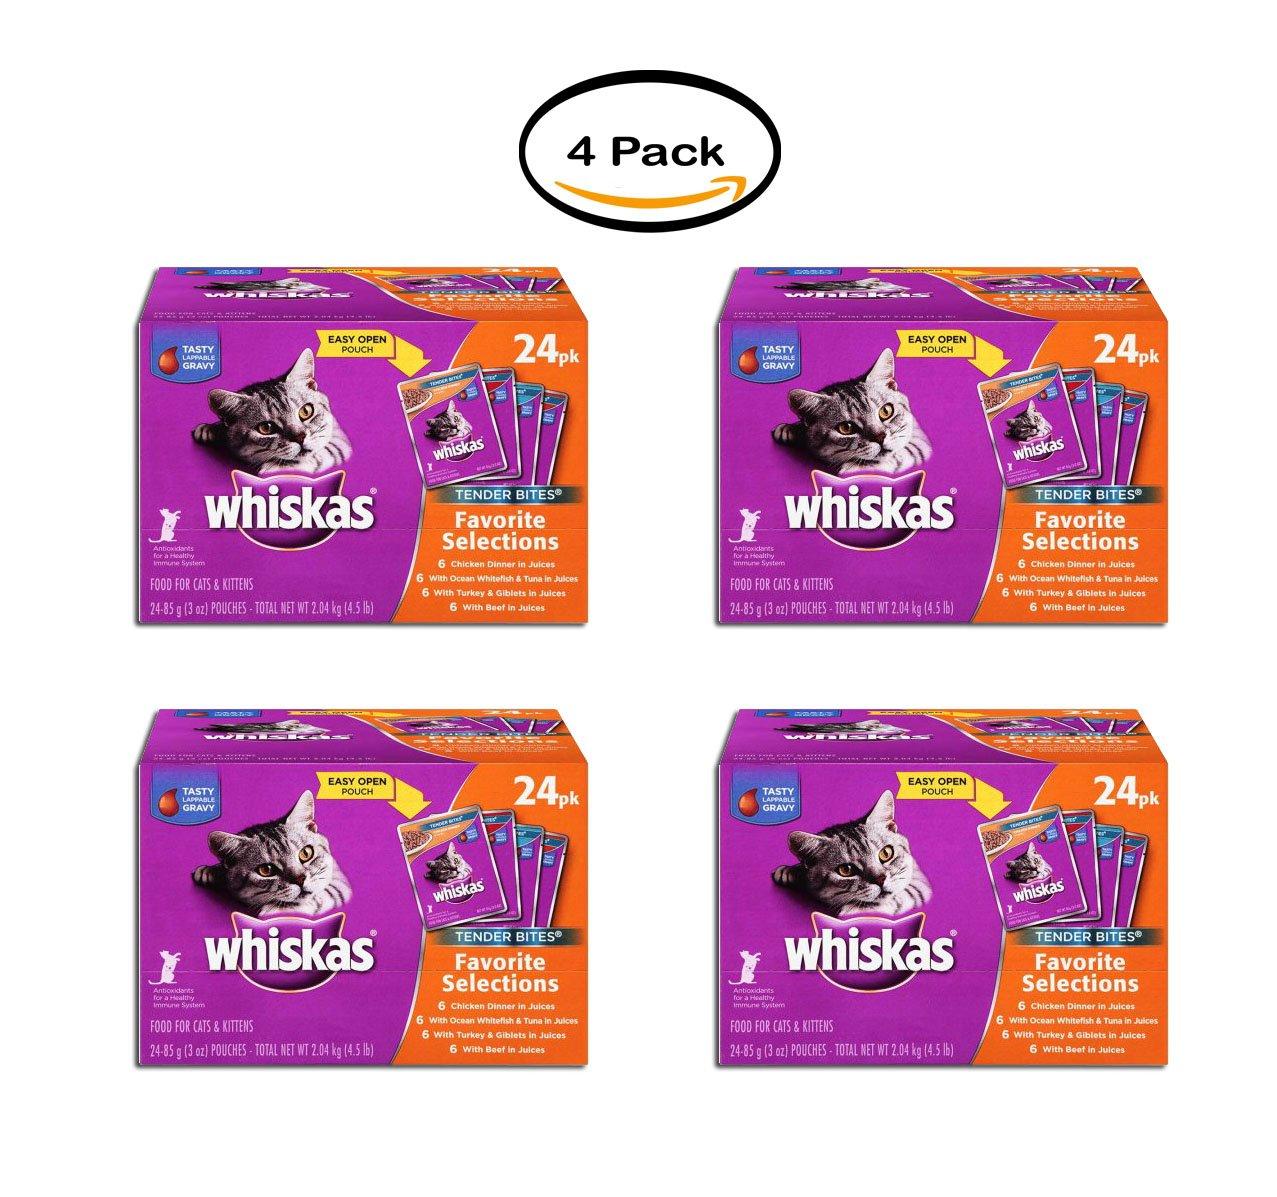 PACK OF 4 - WHISKAS TENDER BITES Favorite Selections Variety Pack Wet Cat Food 3 Ounces (Pack of 24)